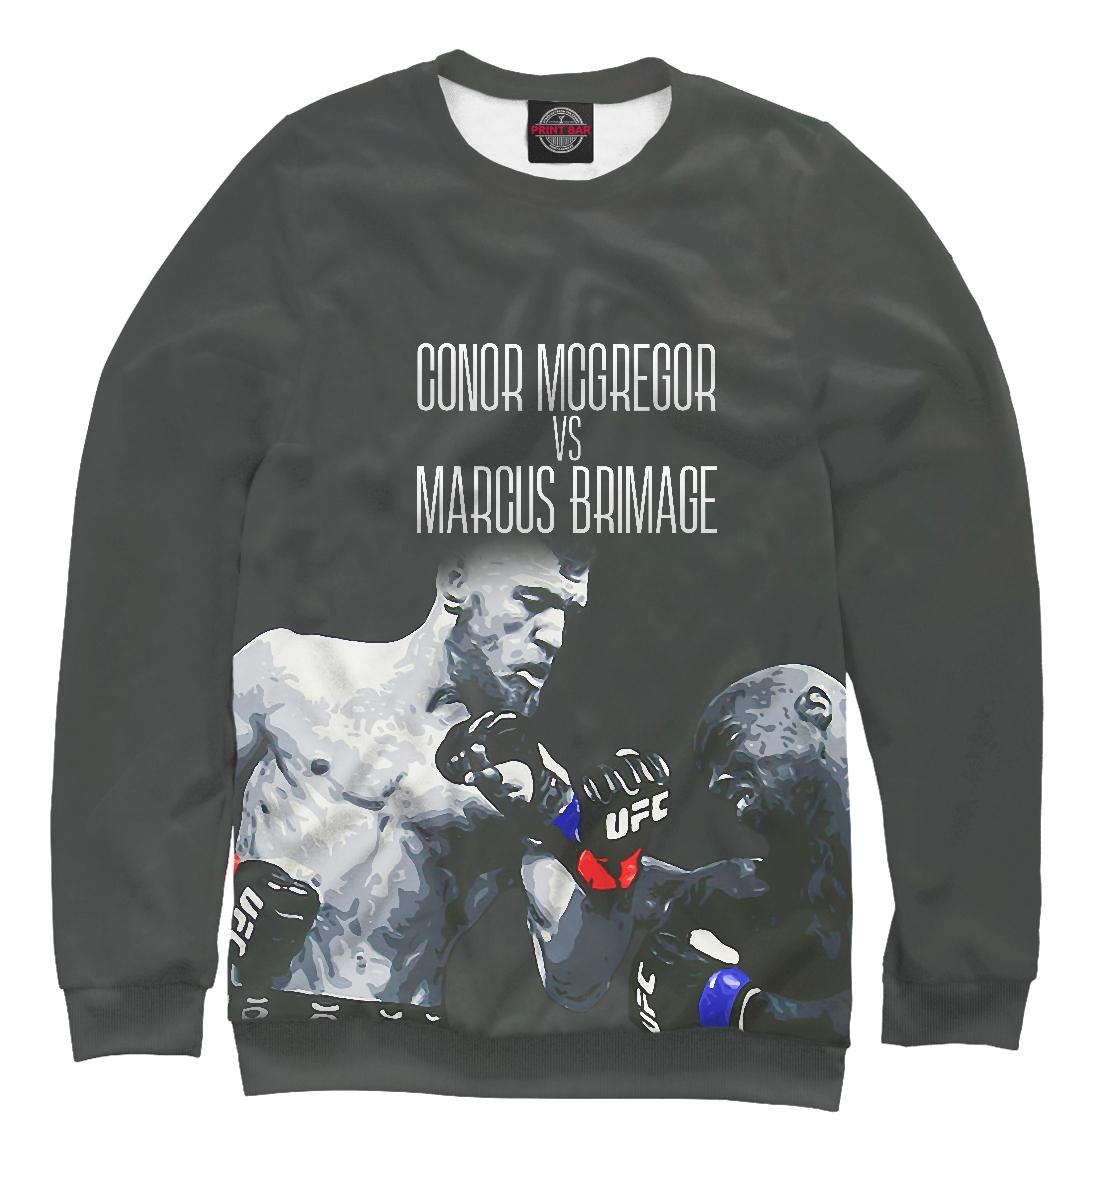 Купить Conor McGregor and Marcus Brimage, Printbar, Свитшоты, MCG-712853-swi-1